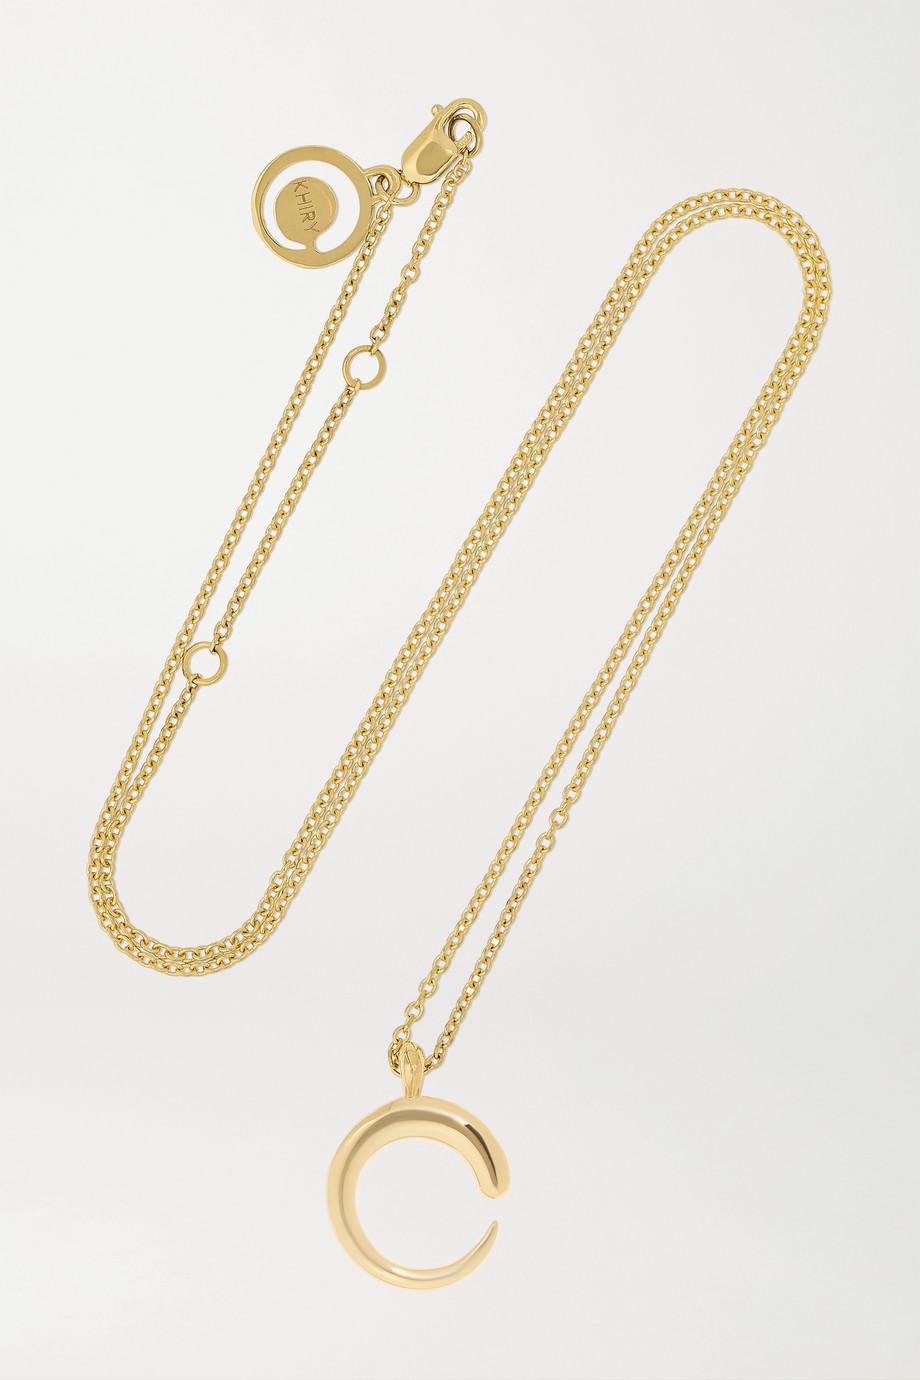 KHIRY Fine Khartoum II 18-karat gold necklace